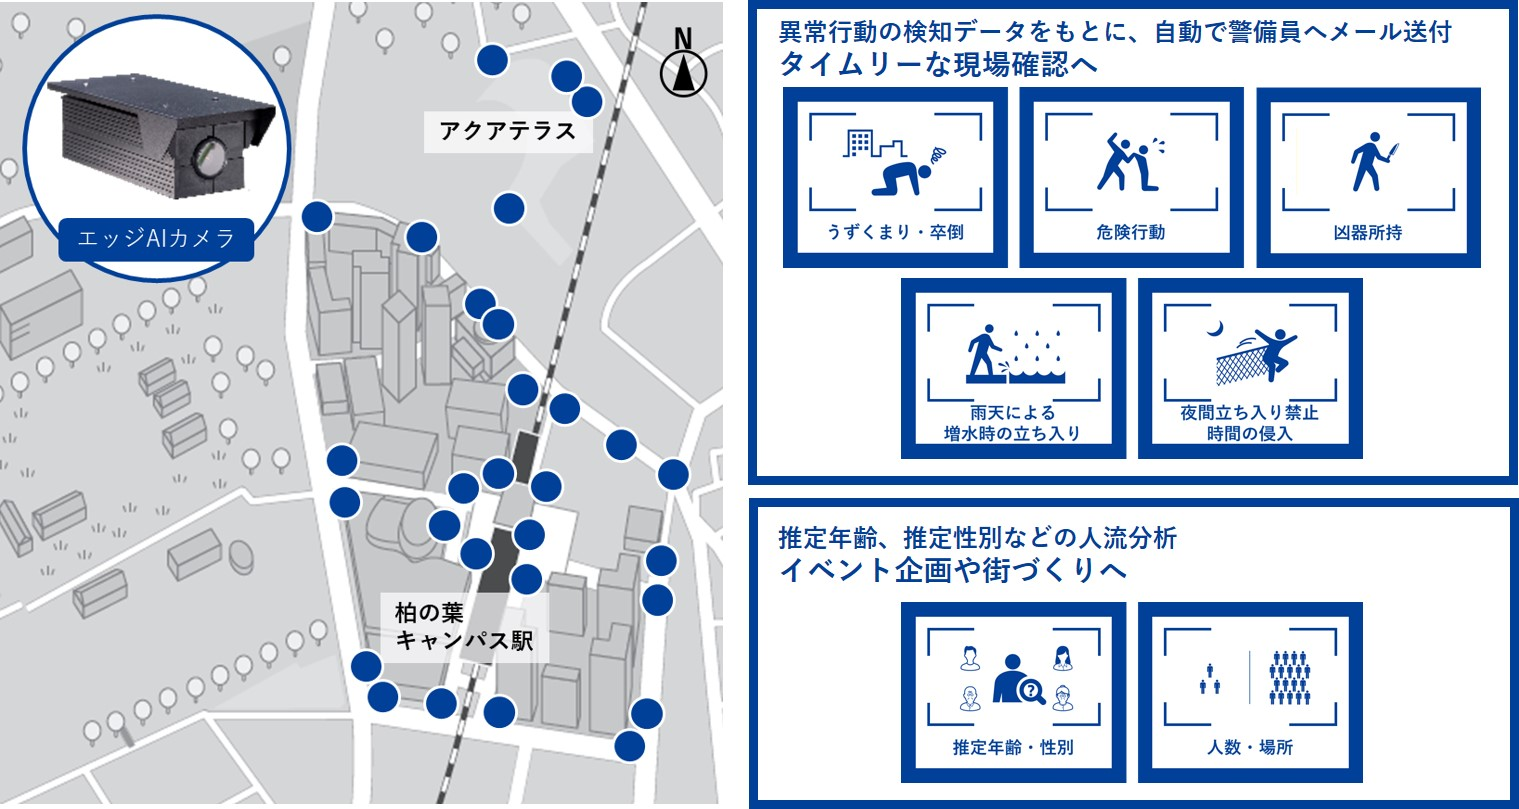 AIカメラを柏の葉スマートシティに導入。リアルタイム画像分析で、住民の安心・安全なタウンマネジメントを開始